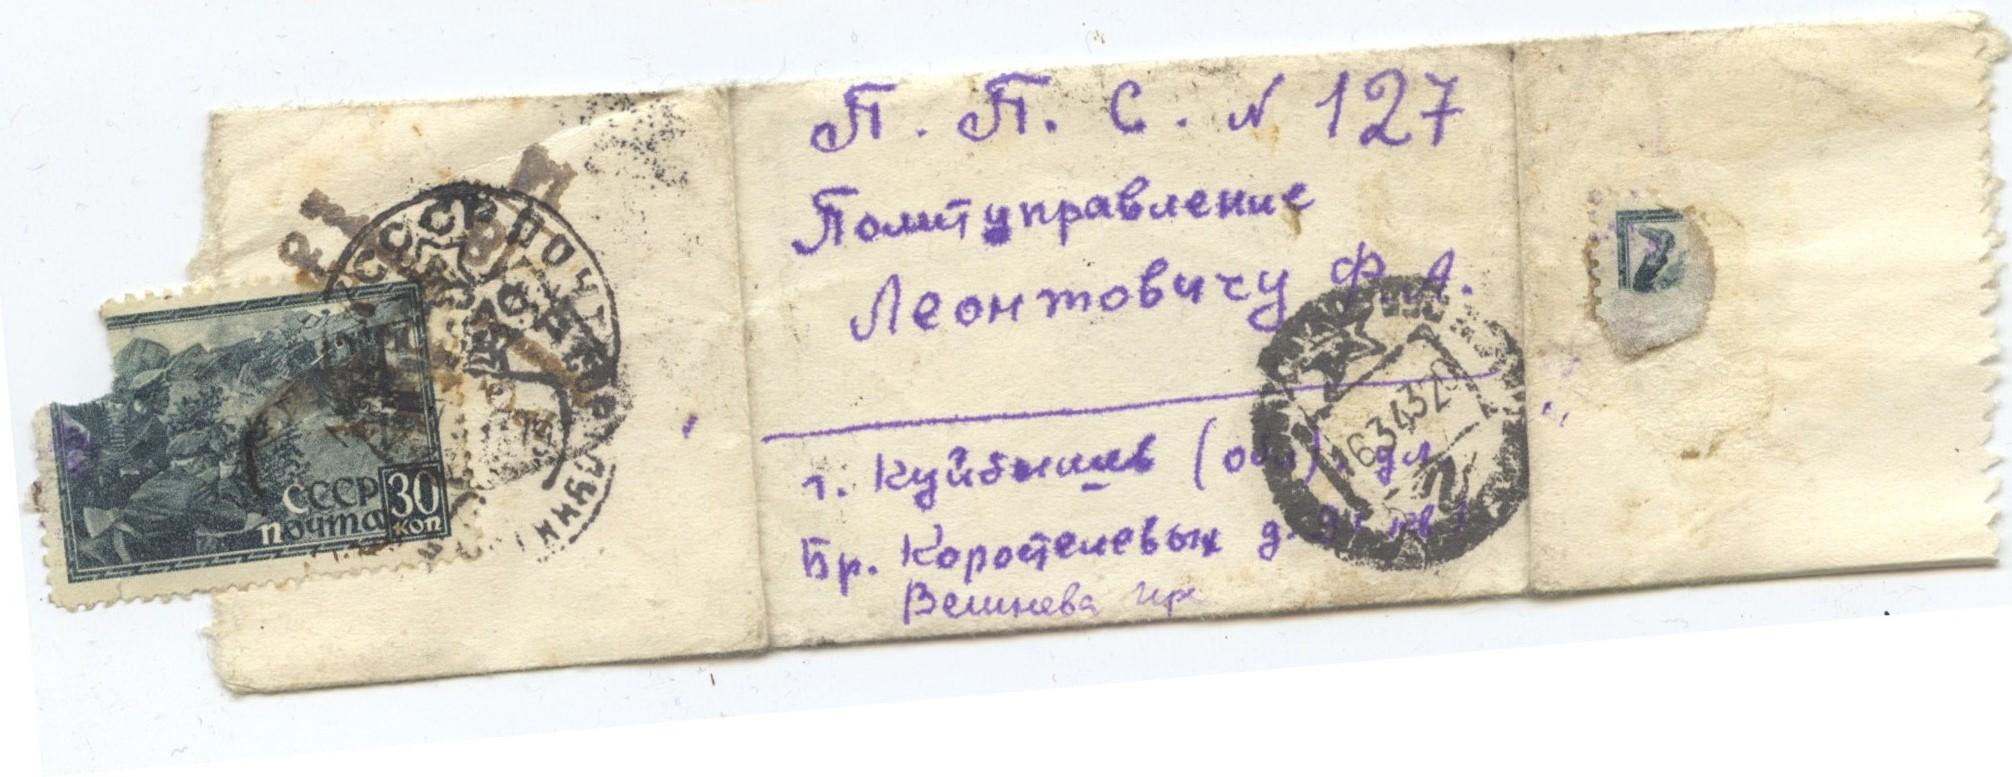 Экспонат #10. Письмо Федору Леонтовичу на фронт. 16 марта 1943 года